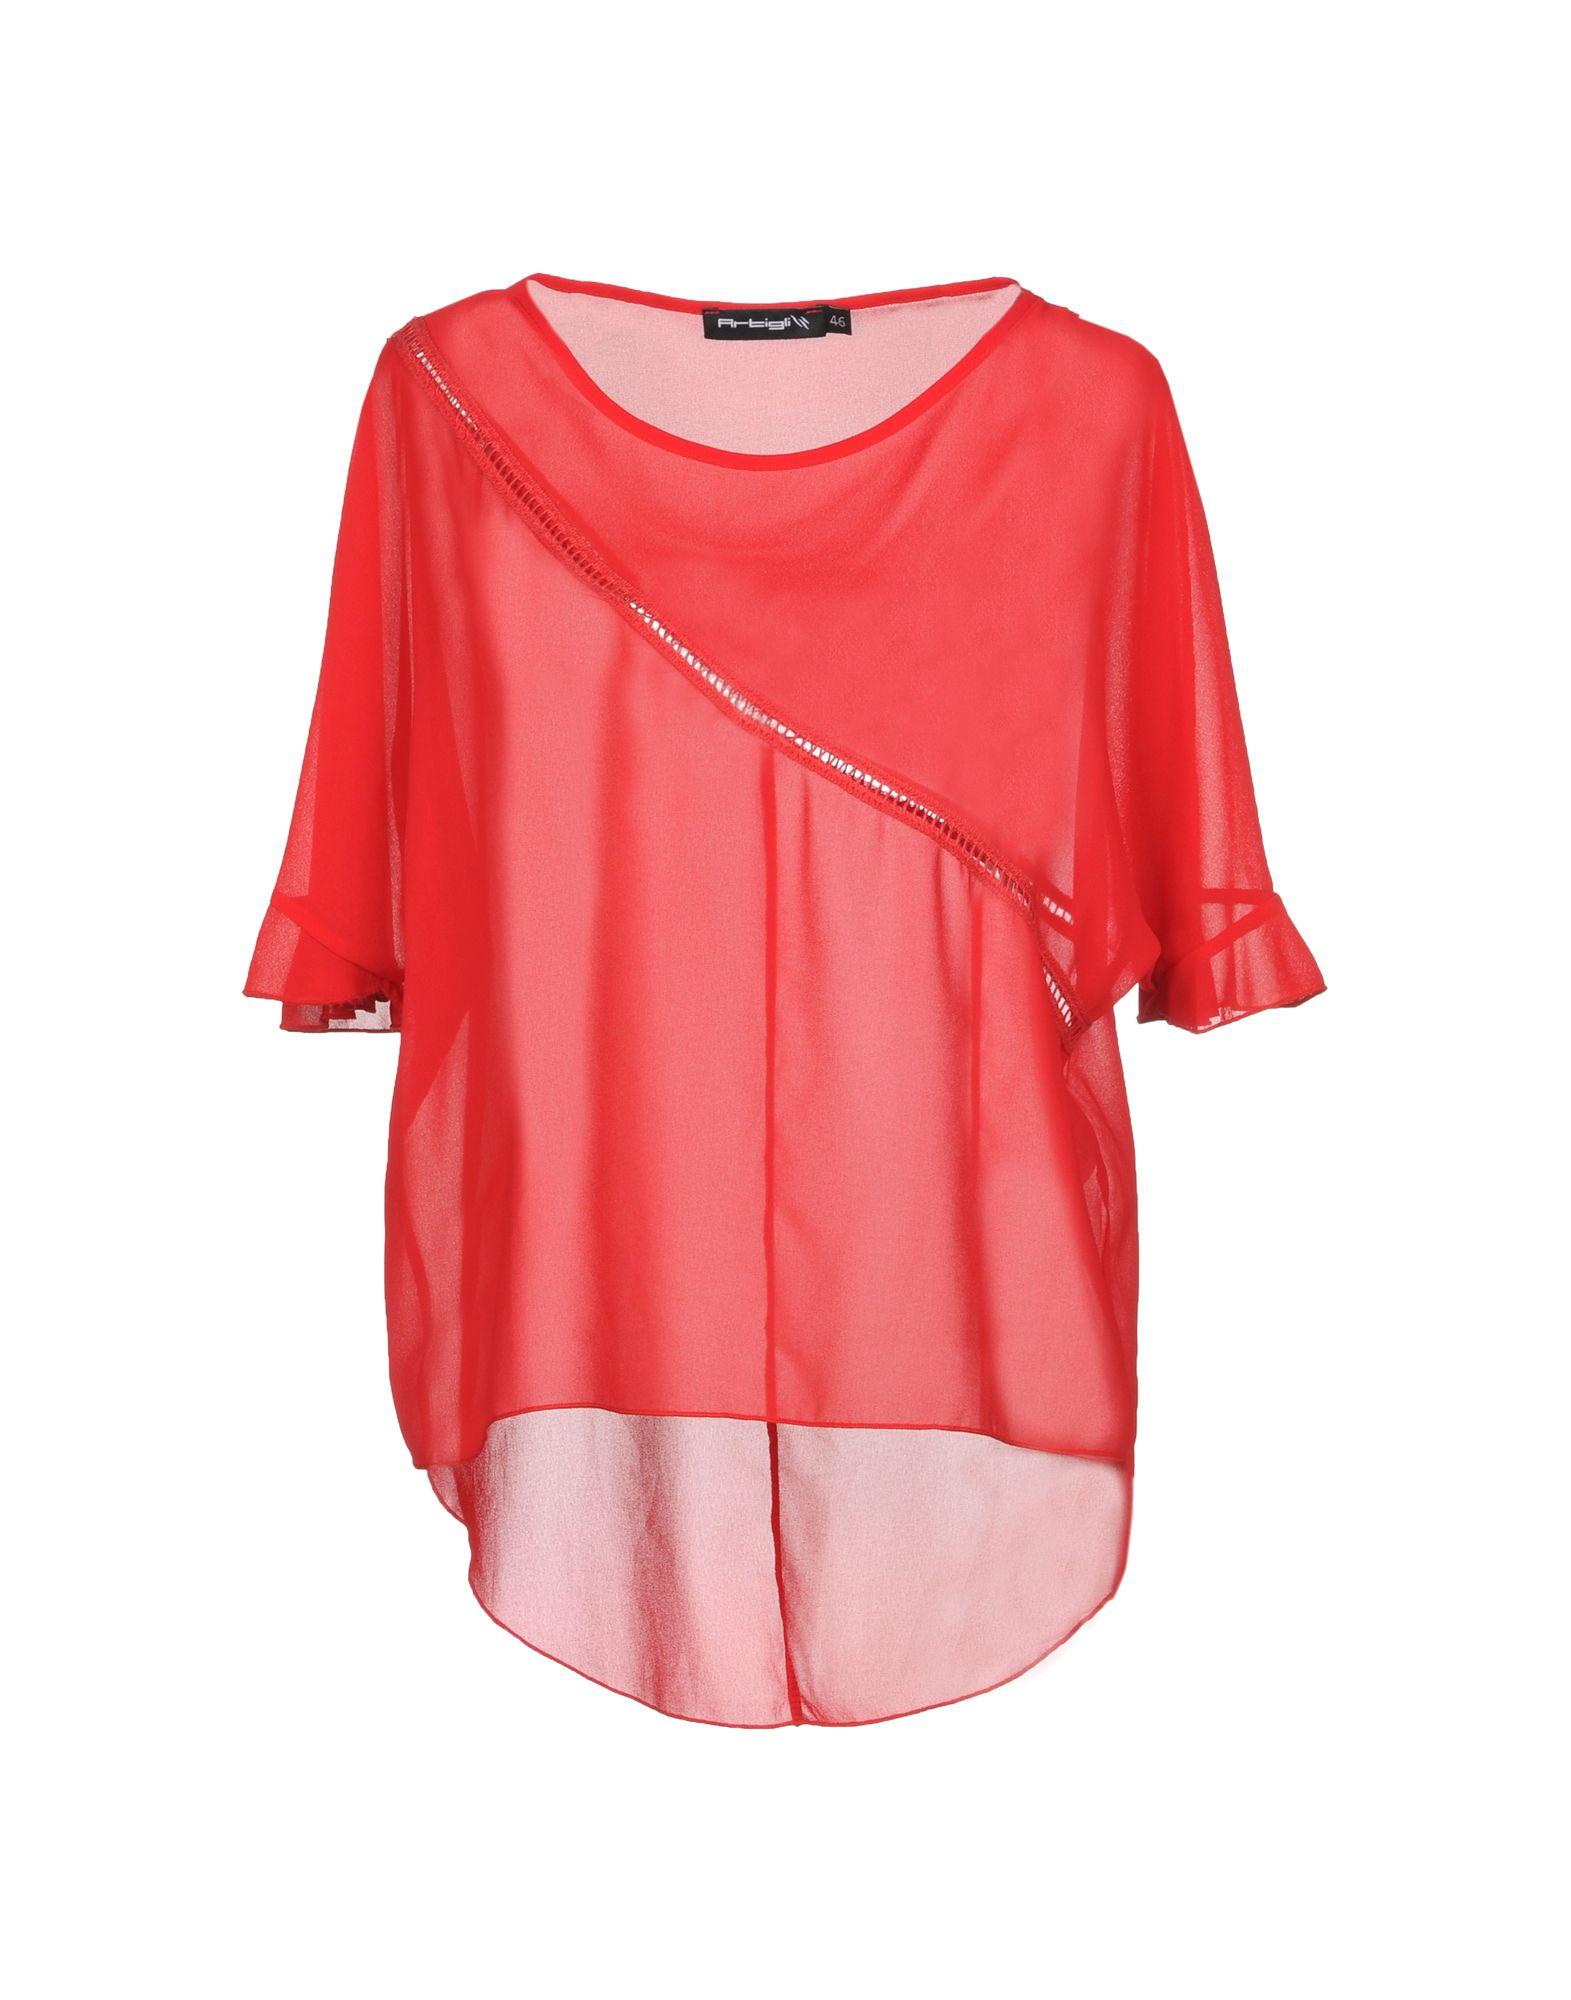 ARTIGLI Блузка artigli юбка для девочки a04557 13 разноцветный artigli